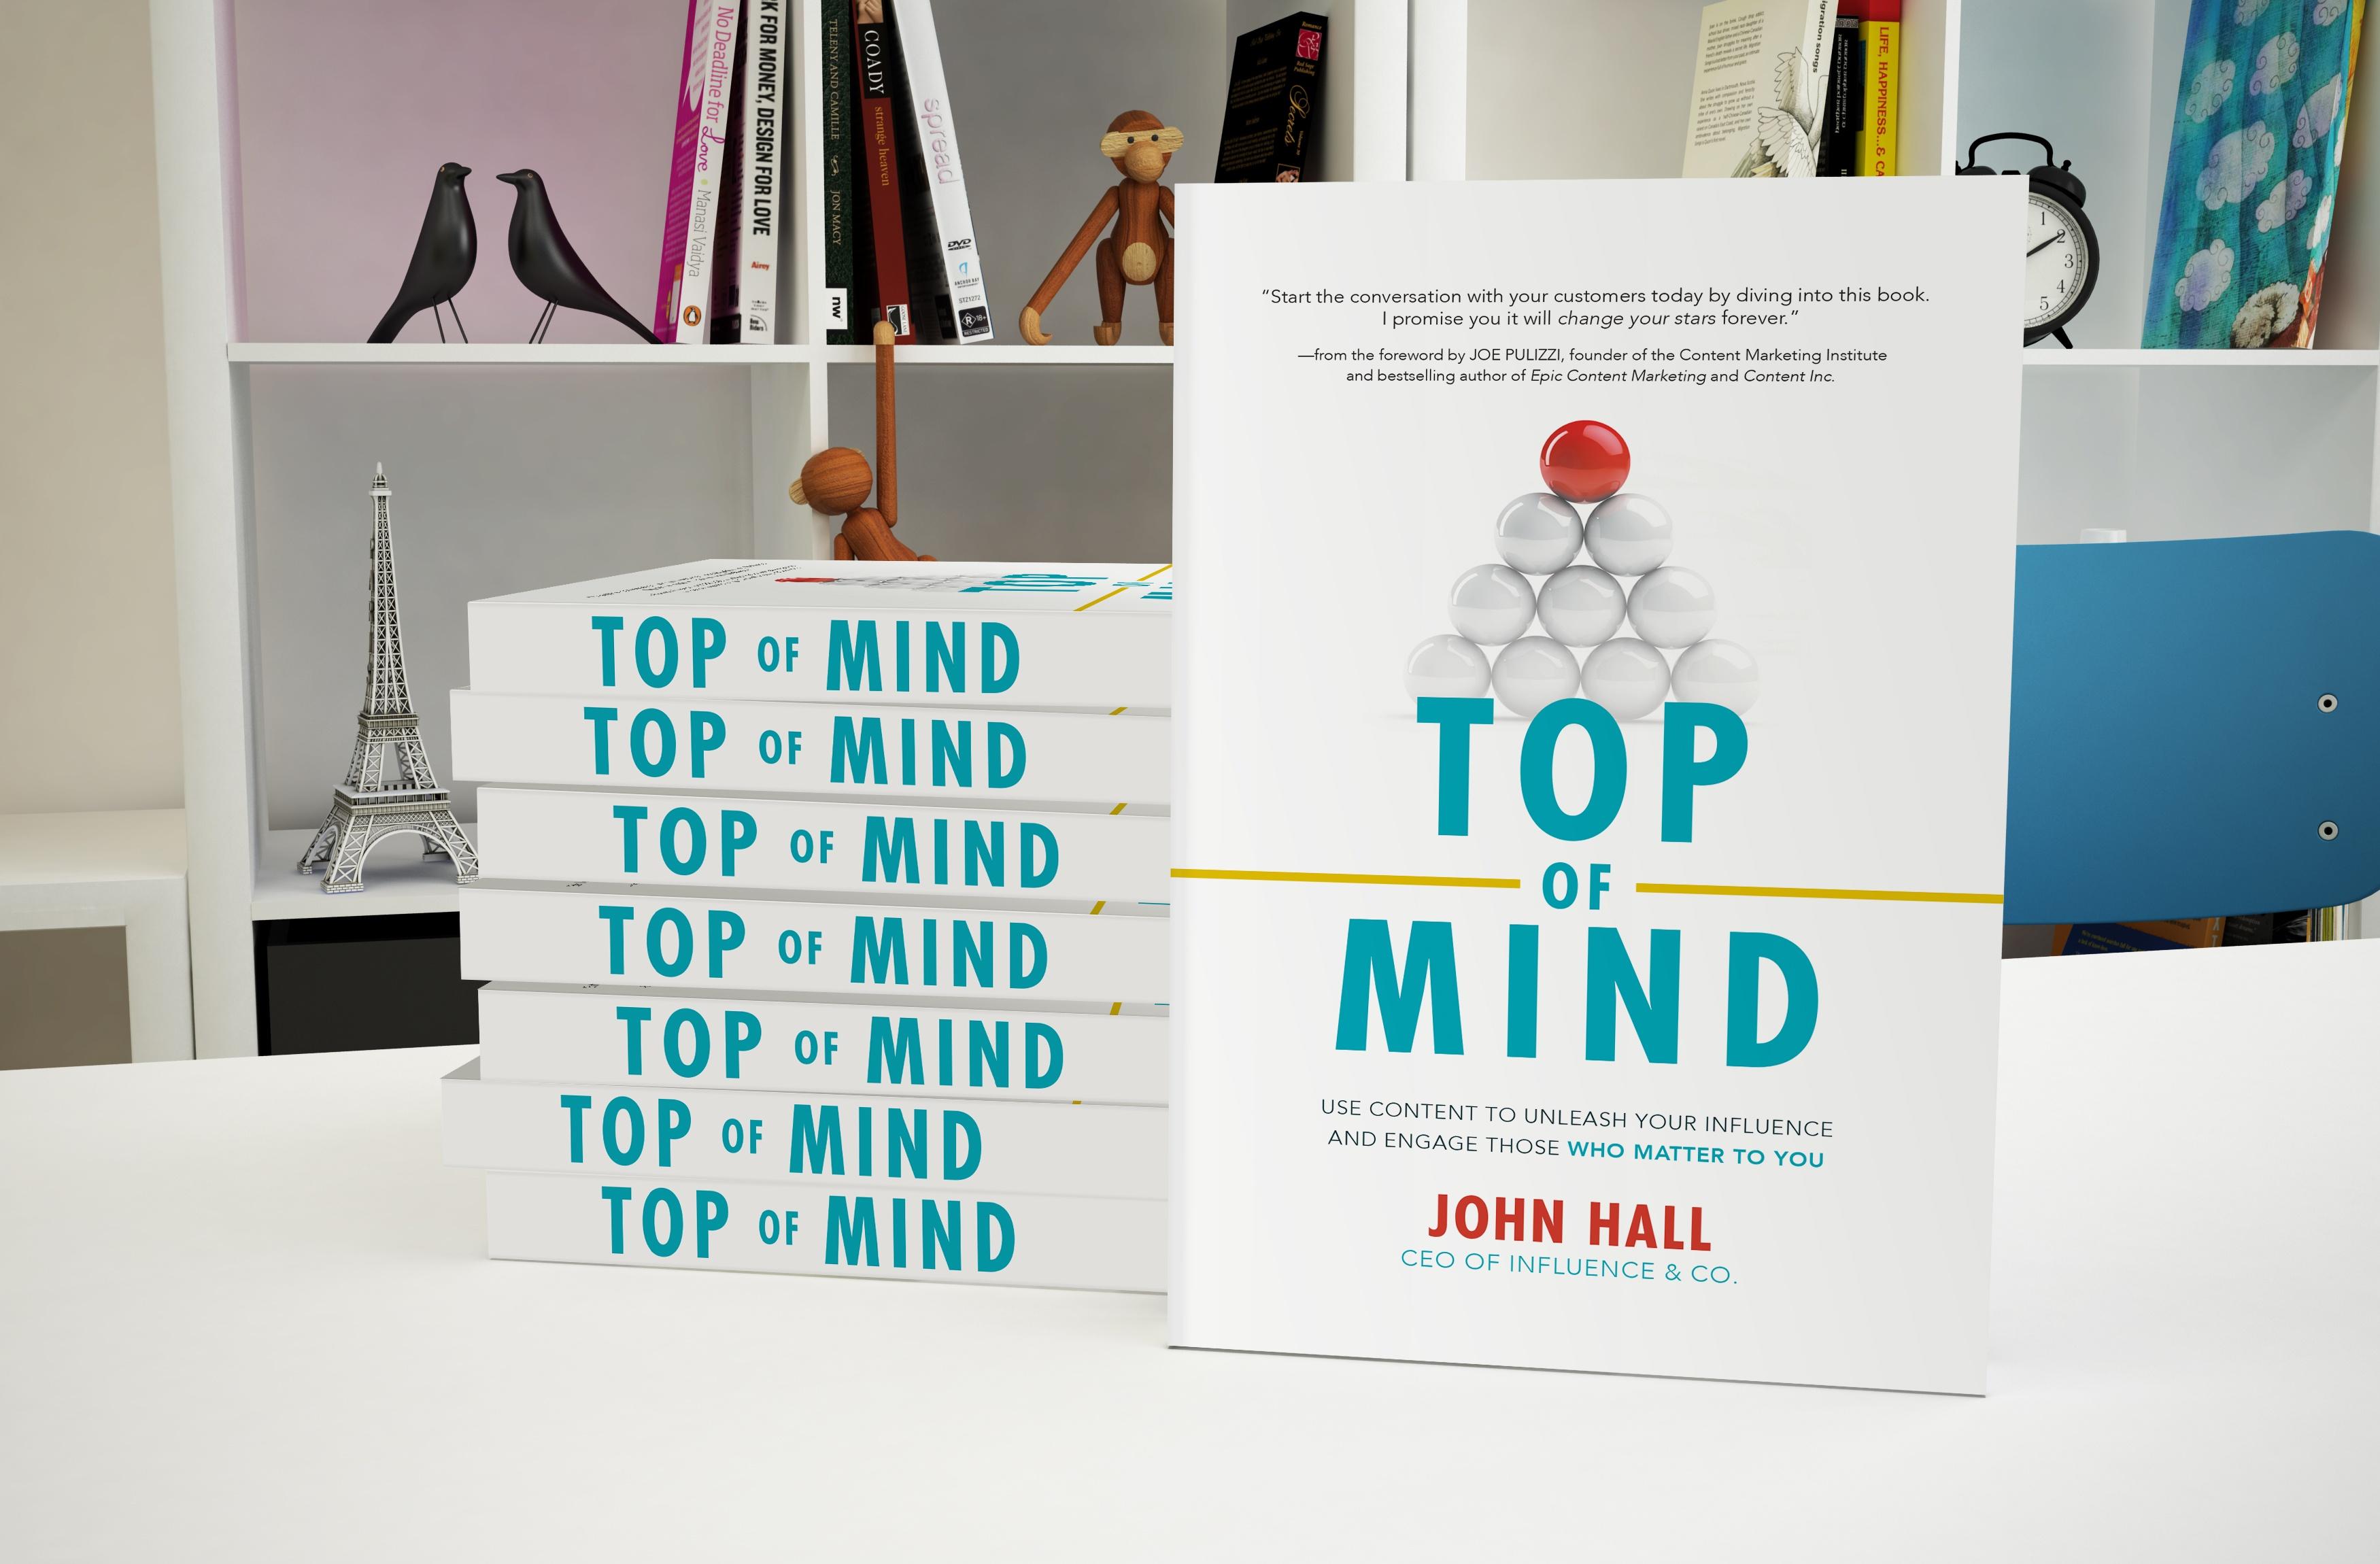 Top-of-Mind-Book-Mockup-Email-Header.jpg